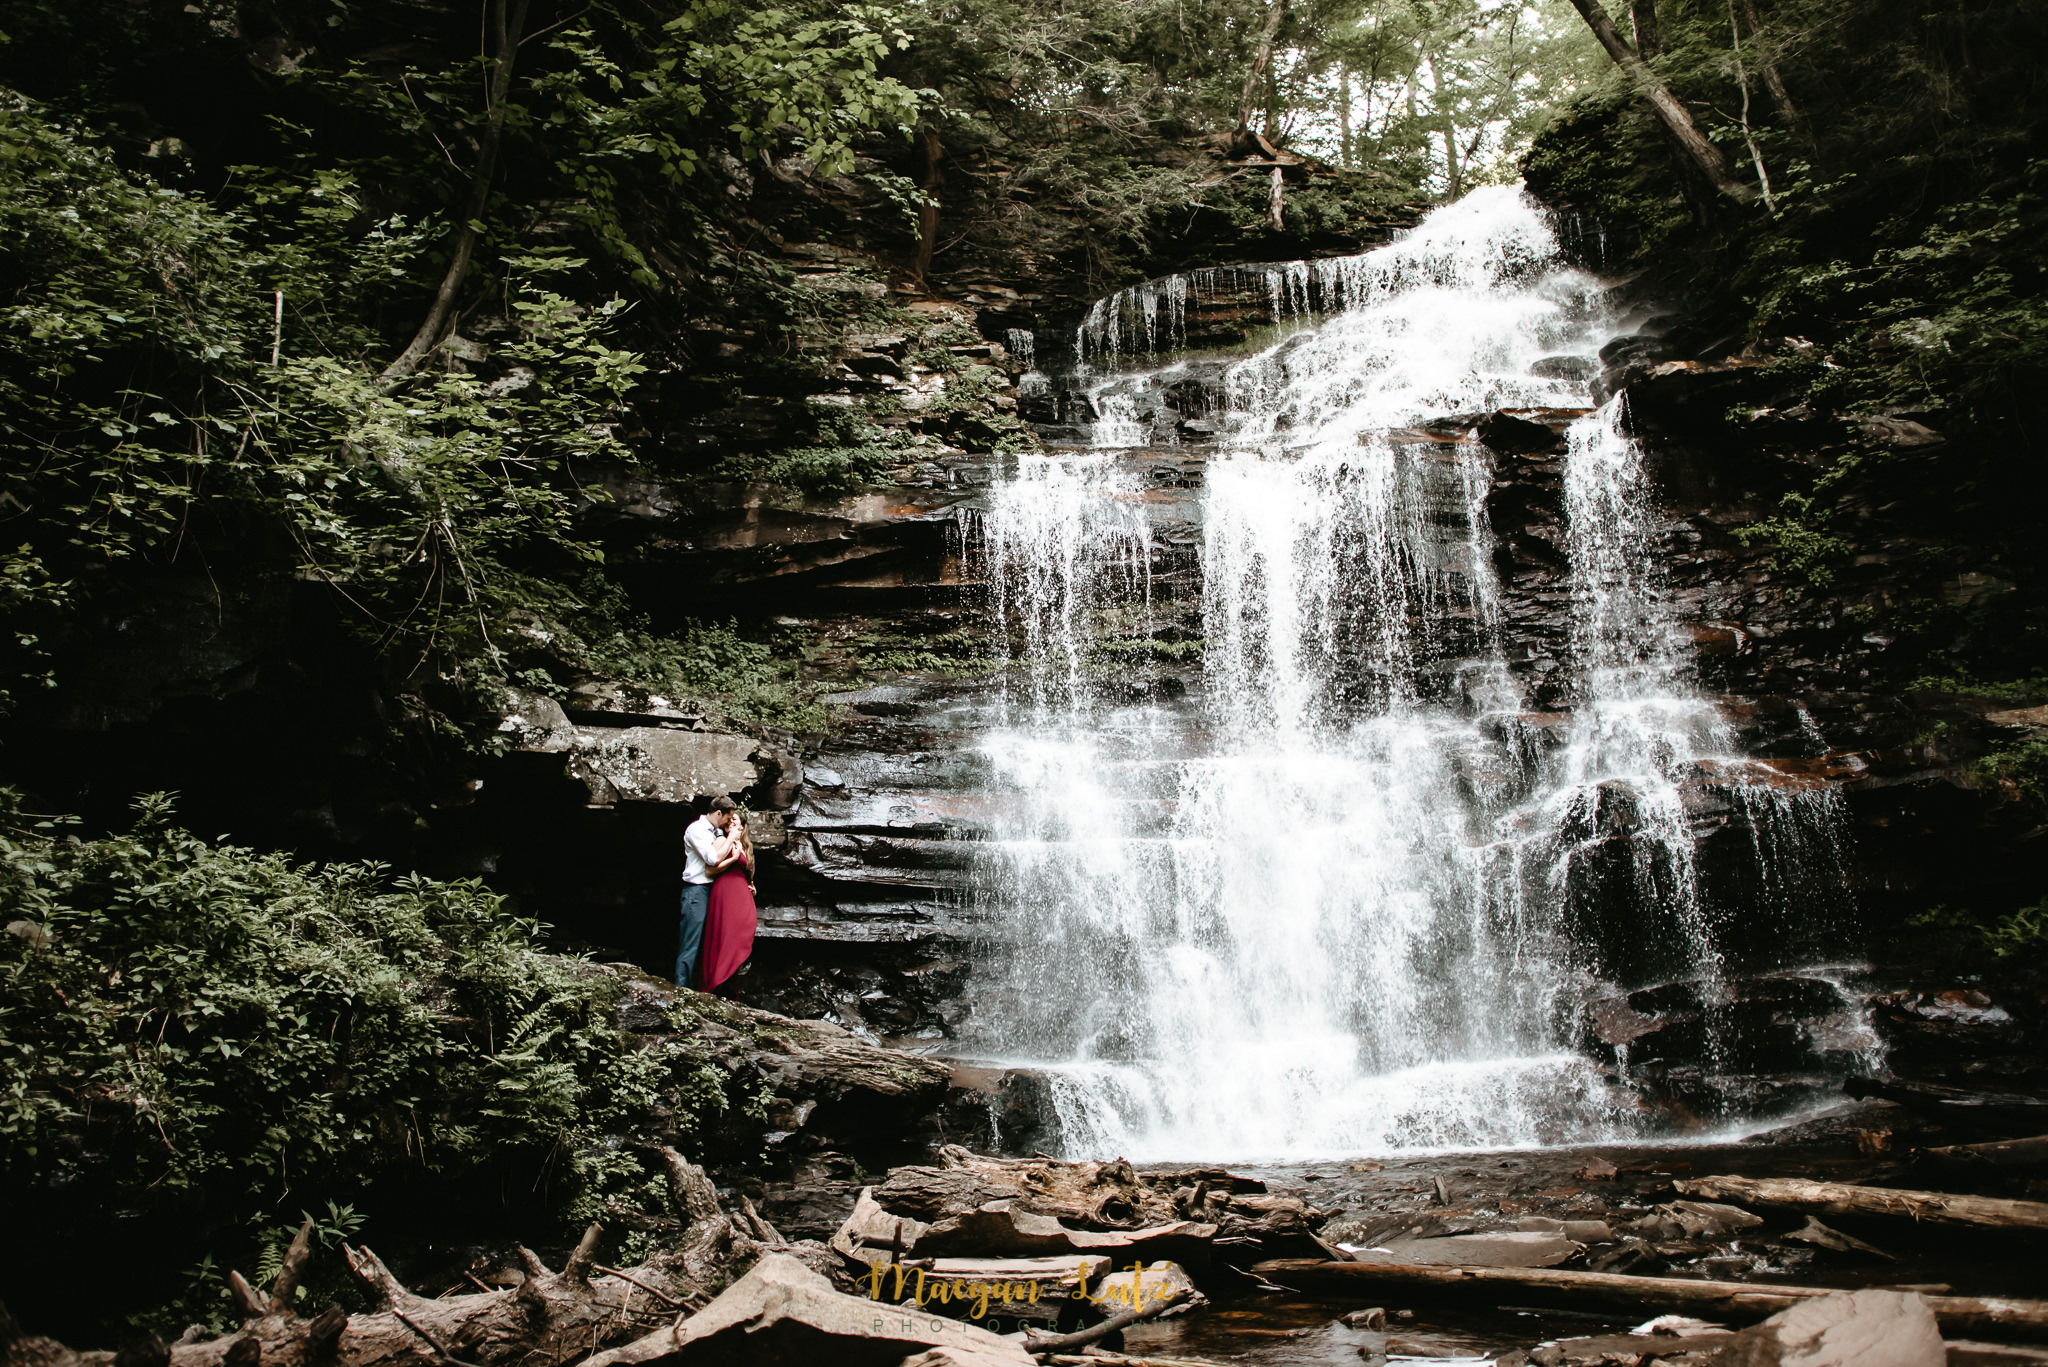 NEPA-Engagement-Wedding-Photographer-Session-at-Ricketts-Glen-State-Park-28.jpg